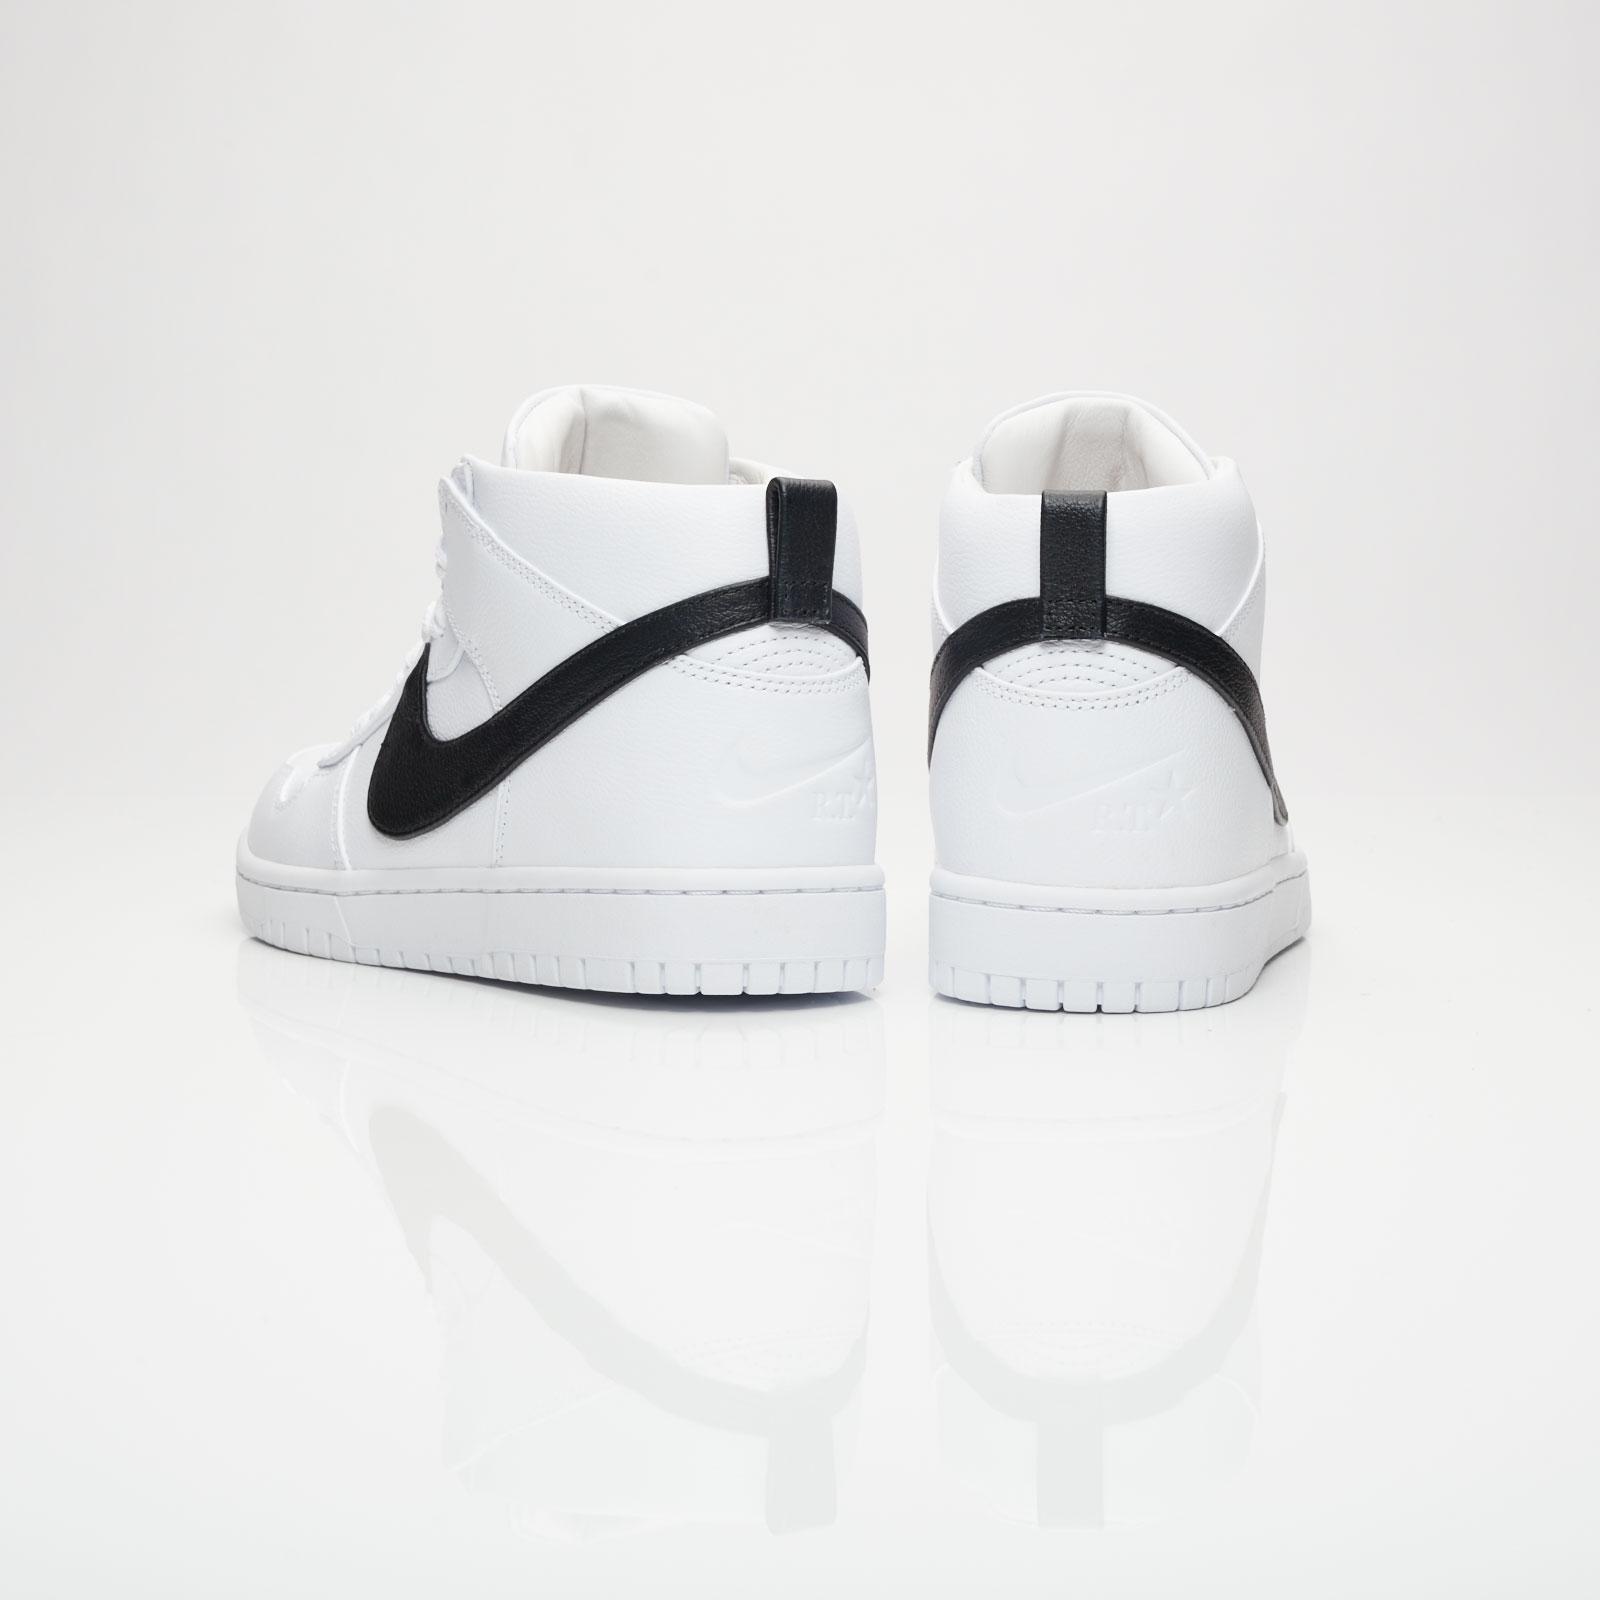 0f65f394c9be Nike Dunk Lux Chukka   Rt - 910088-101 - Sneakersnstuff